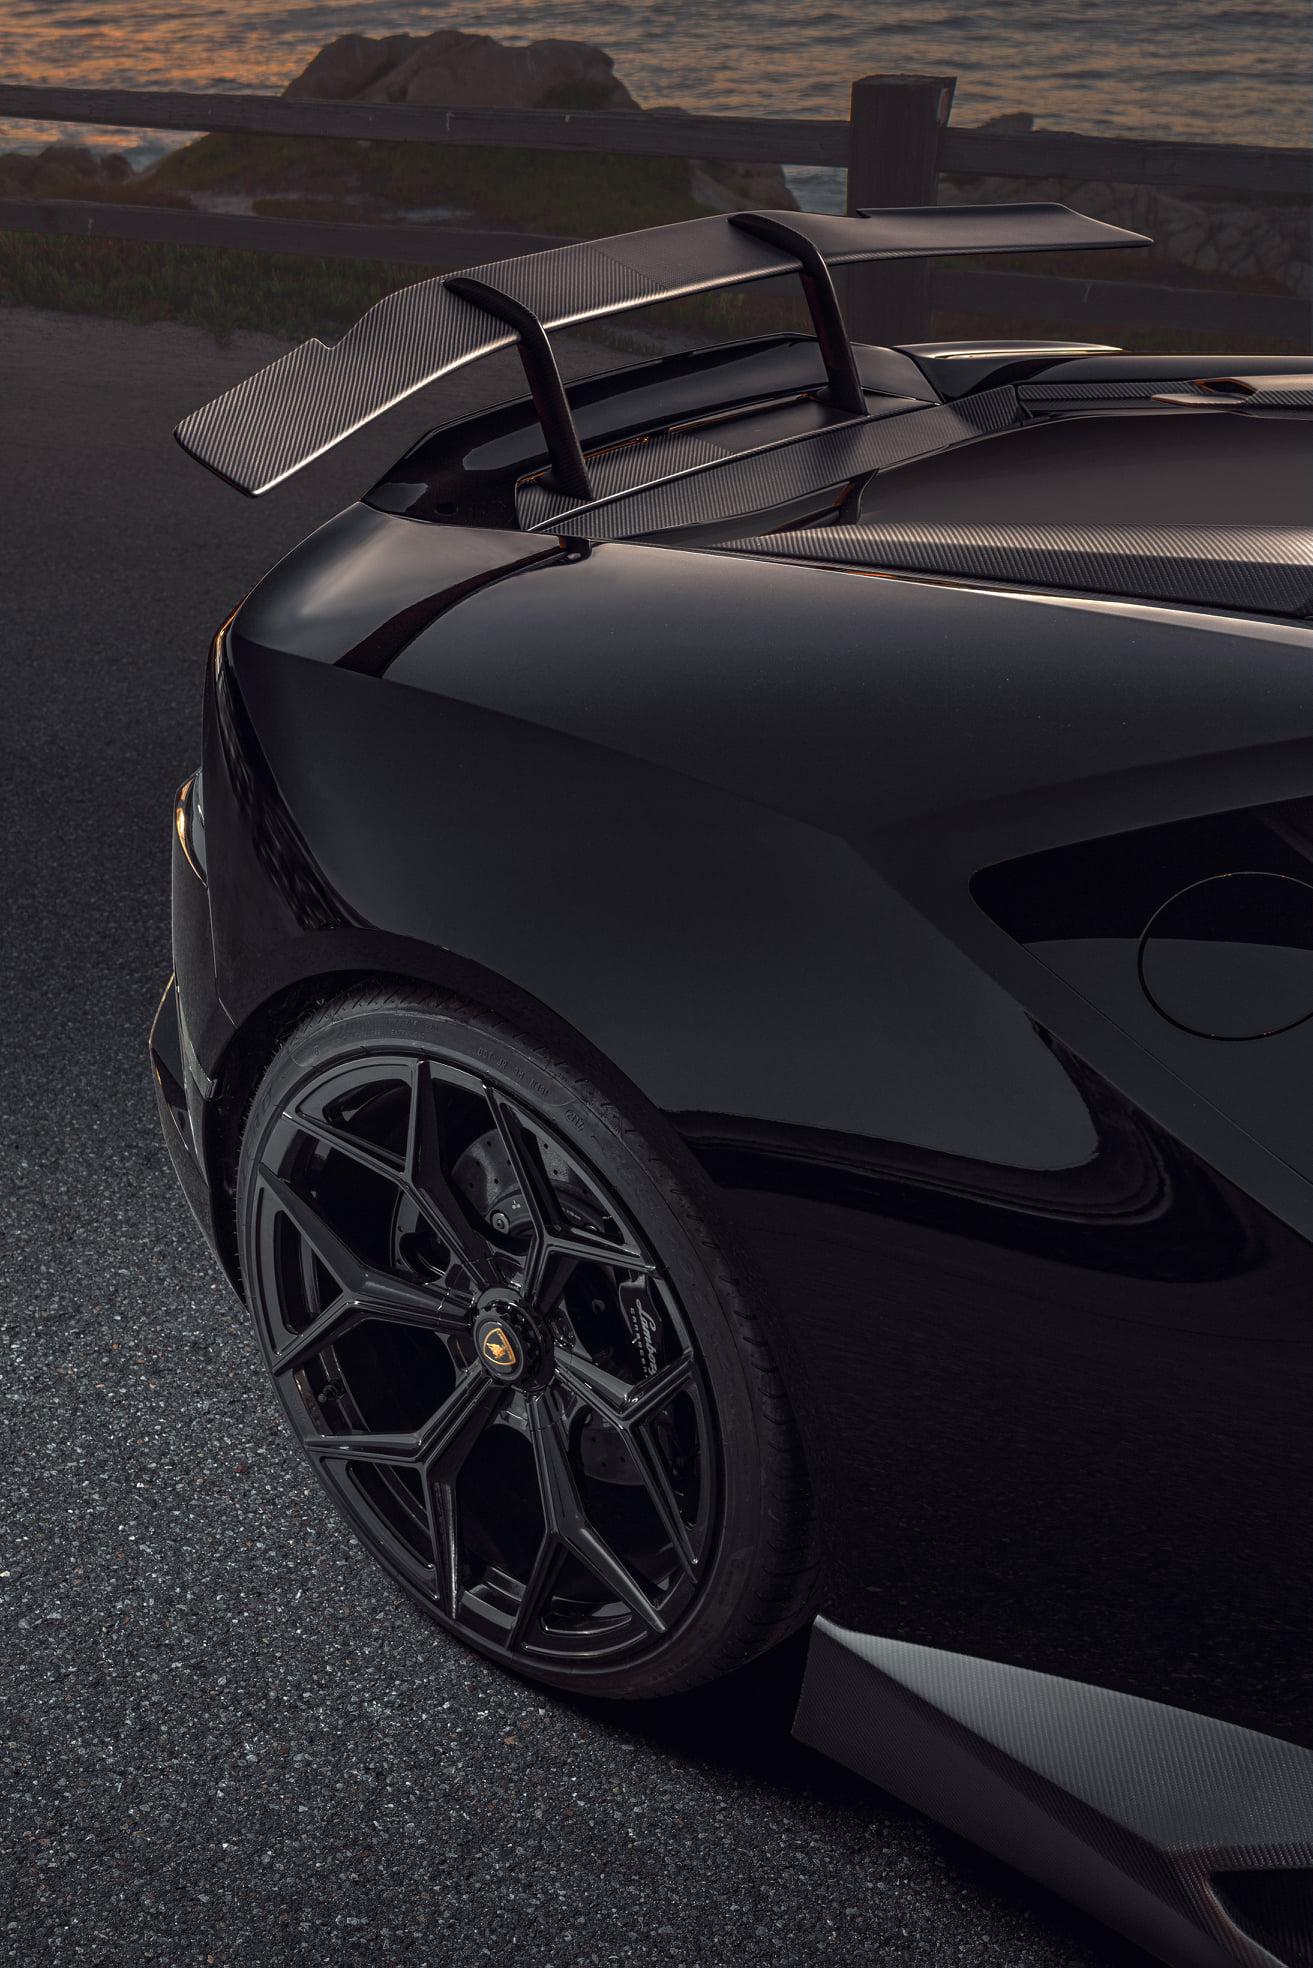 Lamborghini-Huracan-Evo-RWD-by-Novitec-11